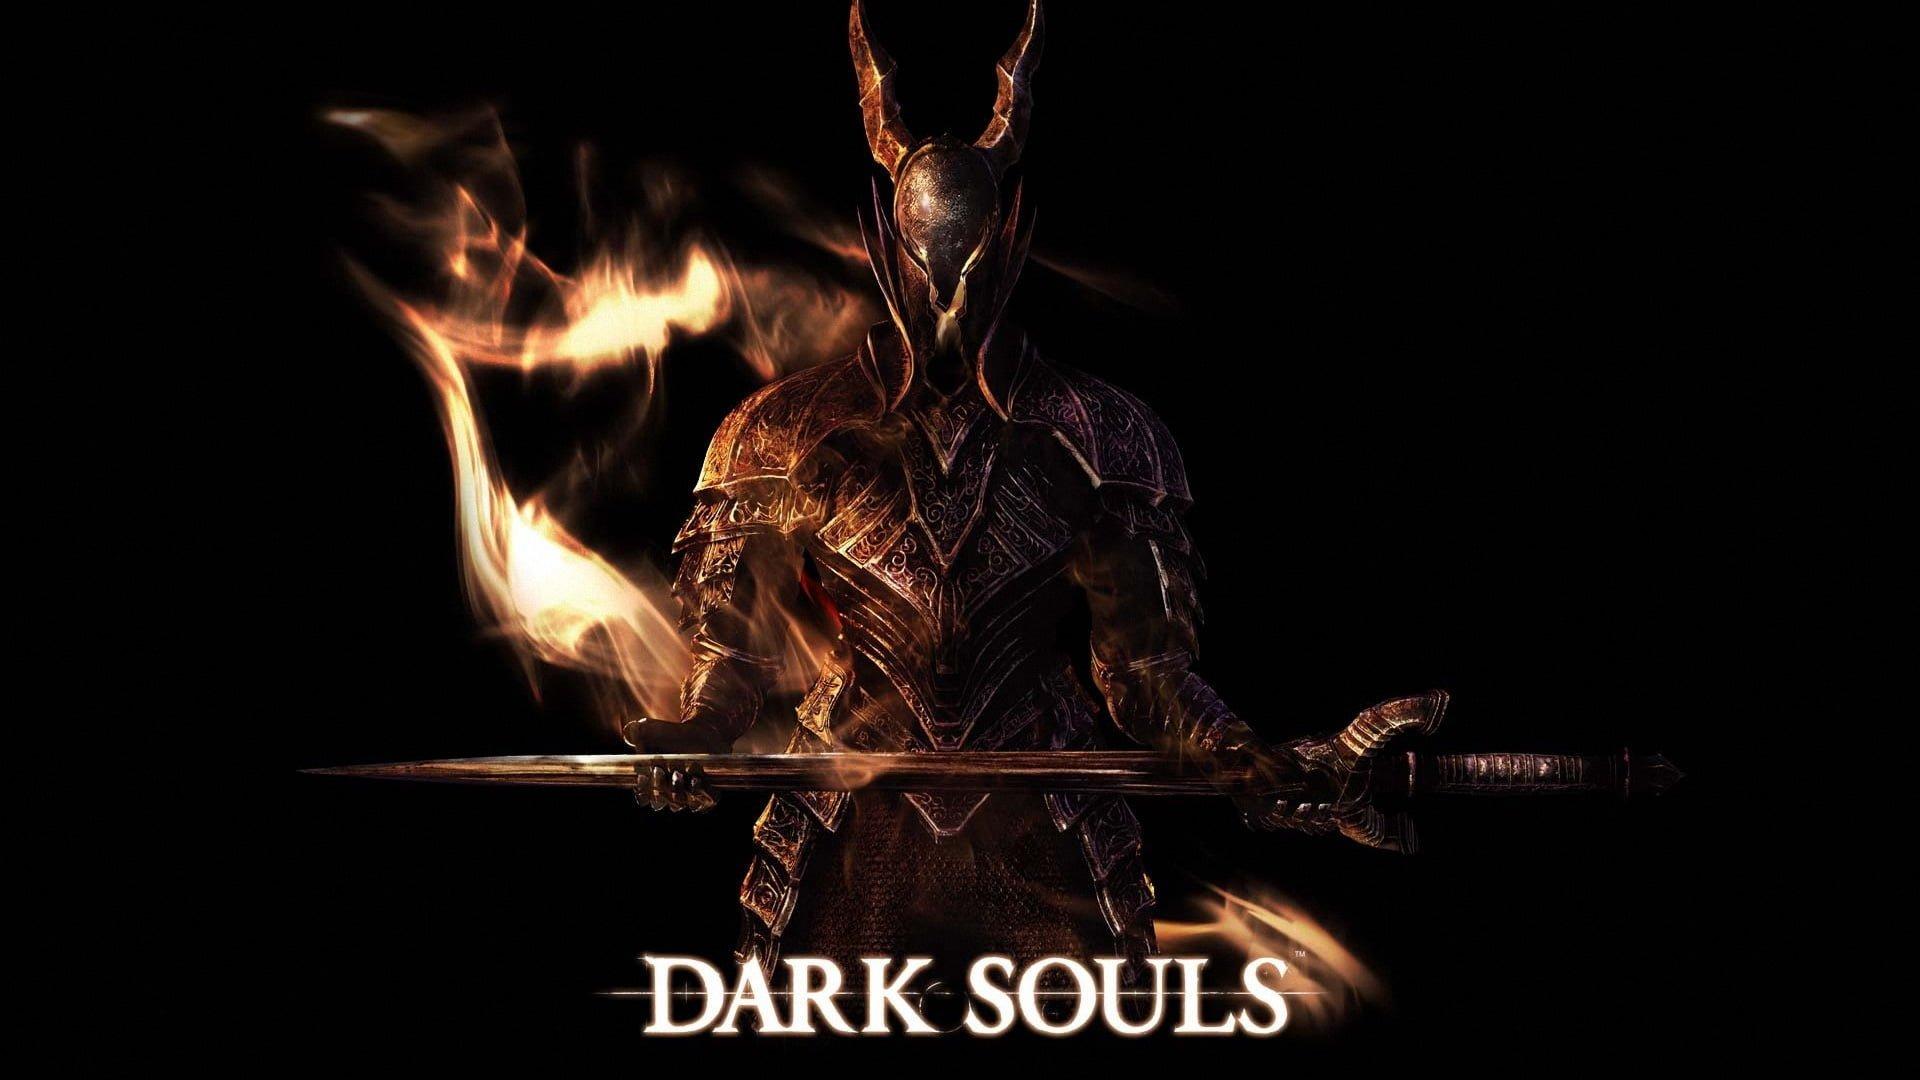 Dark Souls Wallpaper 4k For Phone Hd Backgrounds